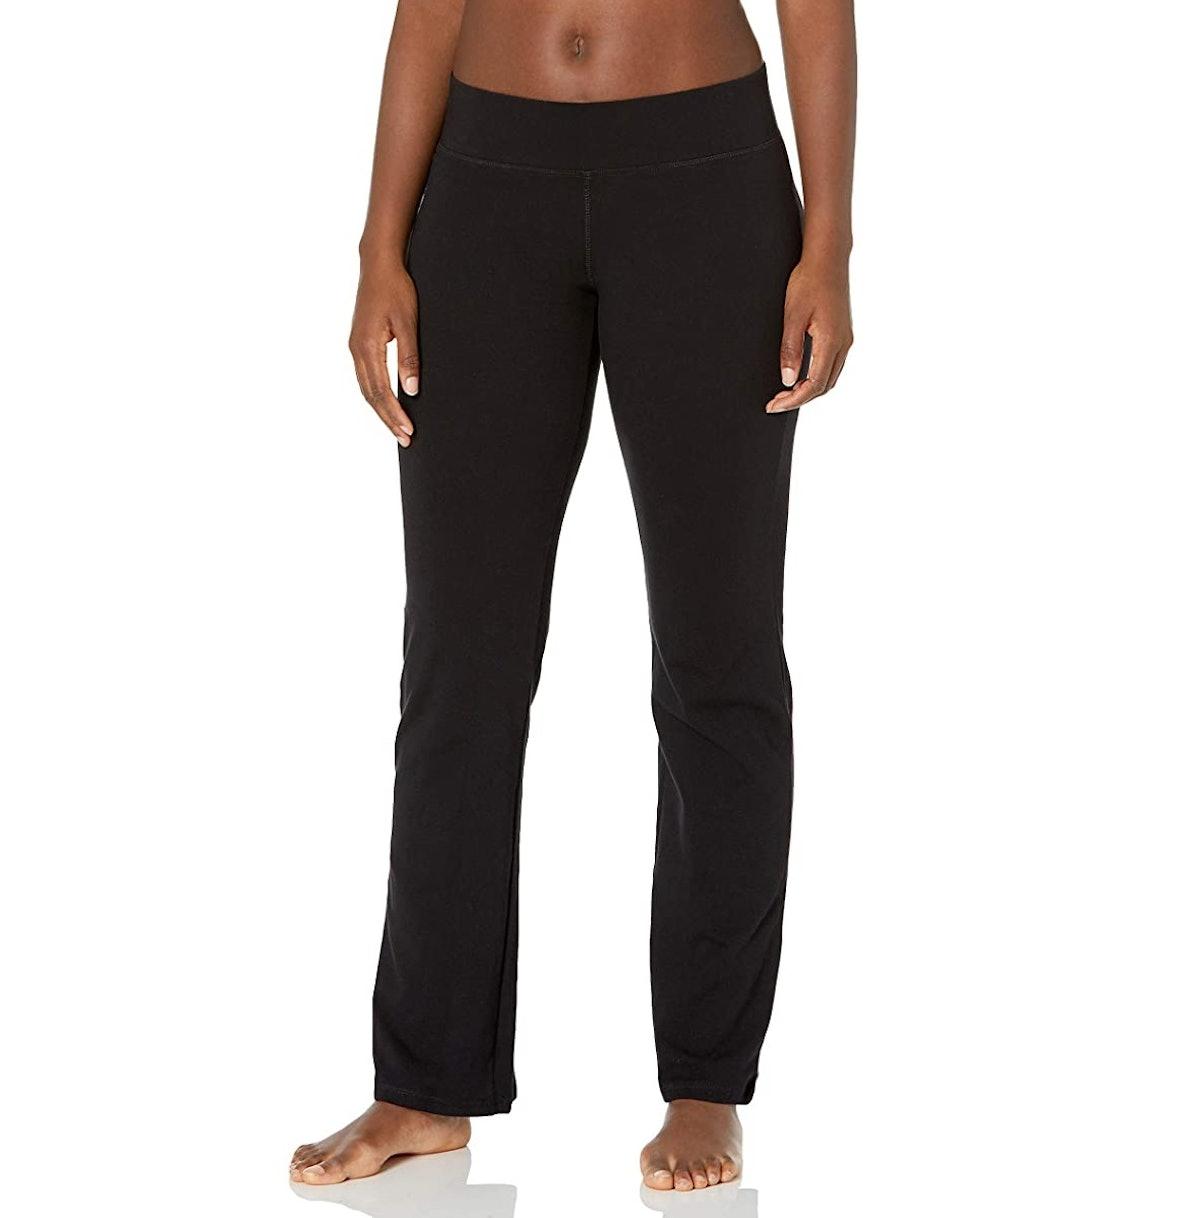 No Nonsense Sport Yoga Pant